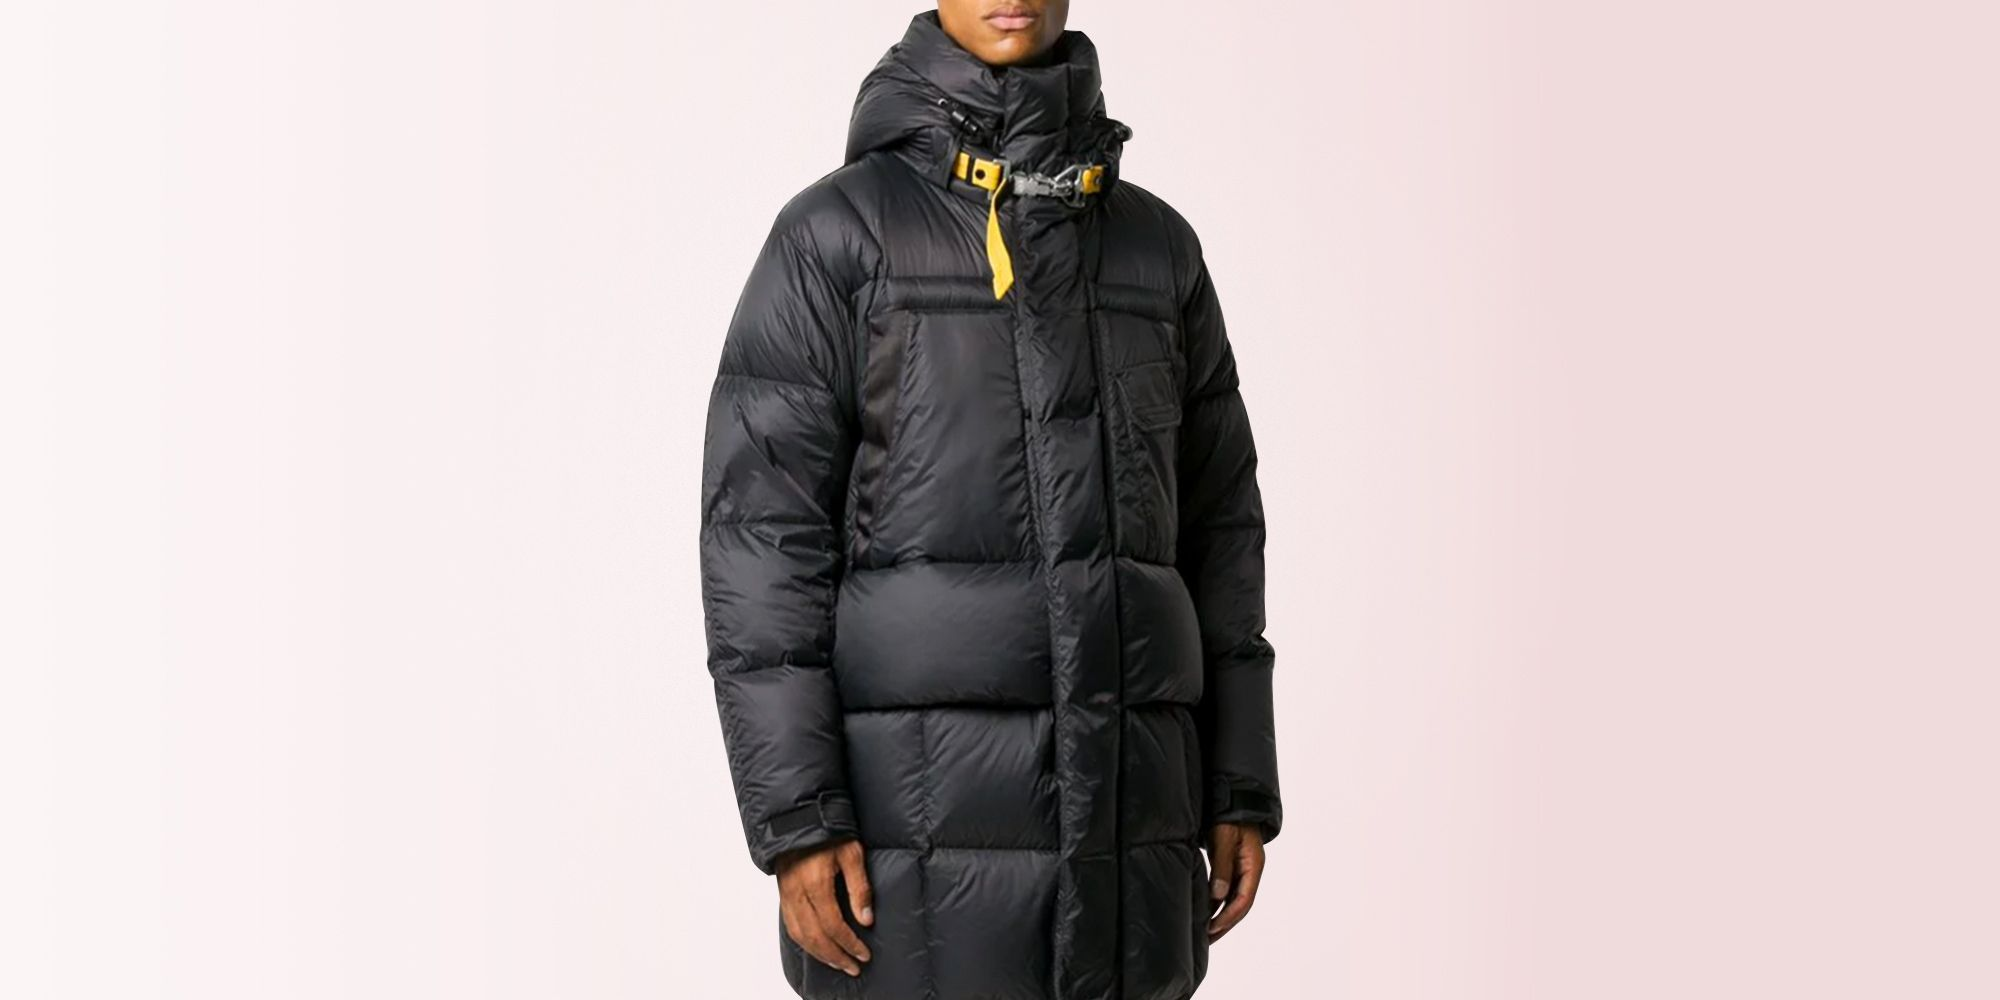 Fashionable parka coats for the winter season